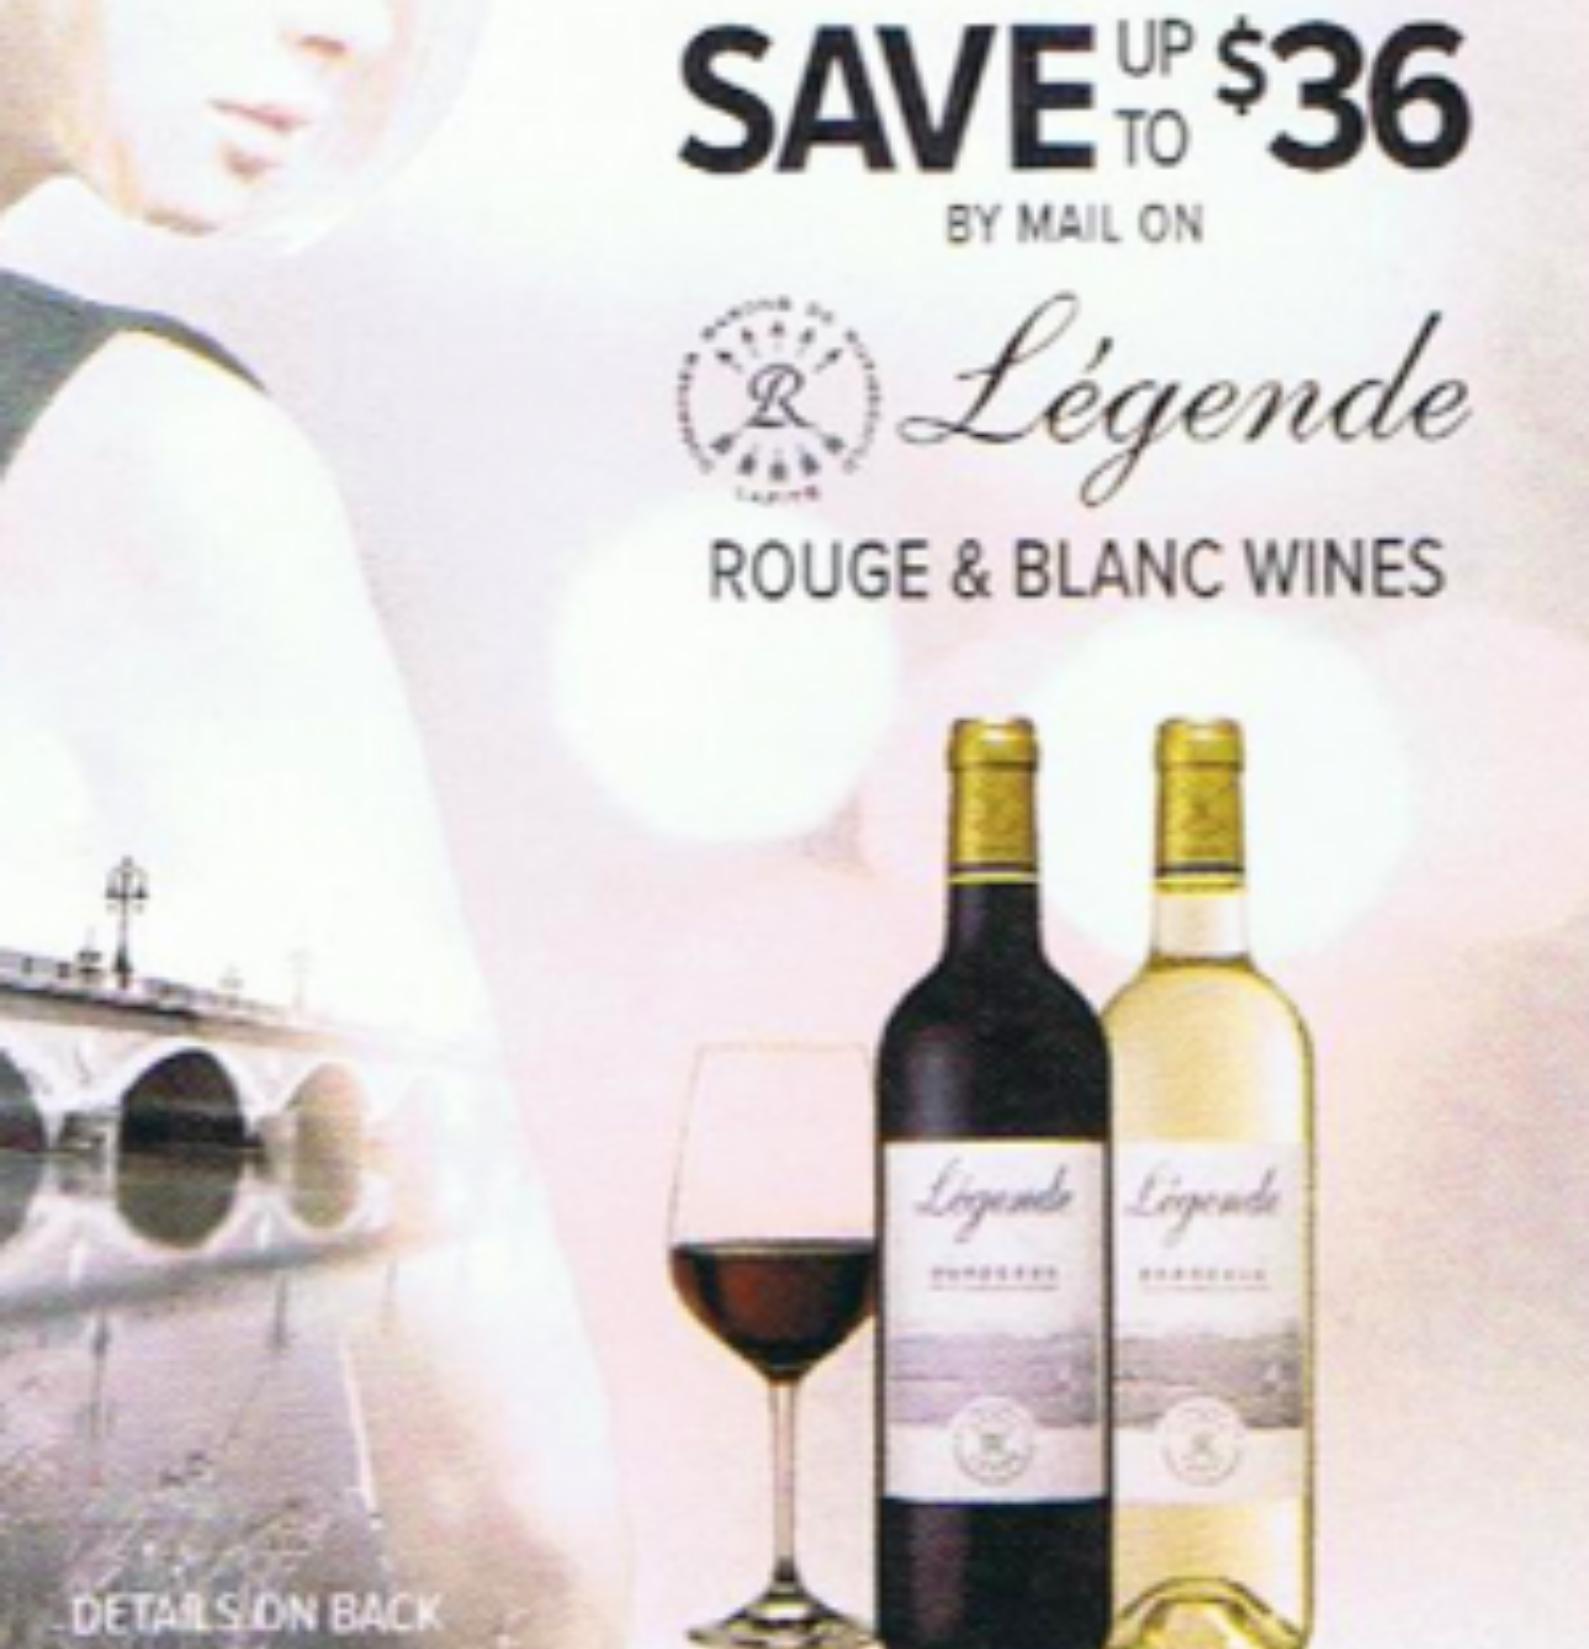 Legende Rouge & Blanc Wines